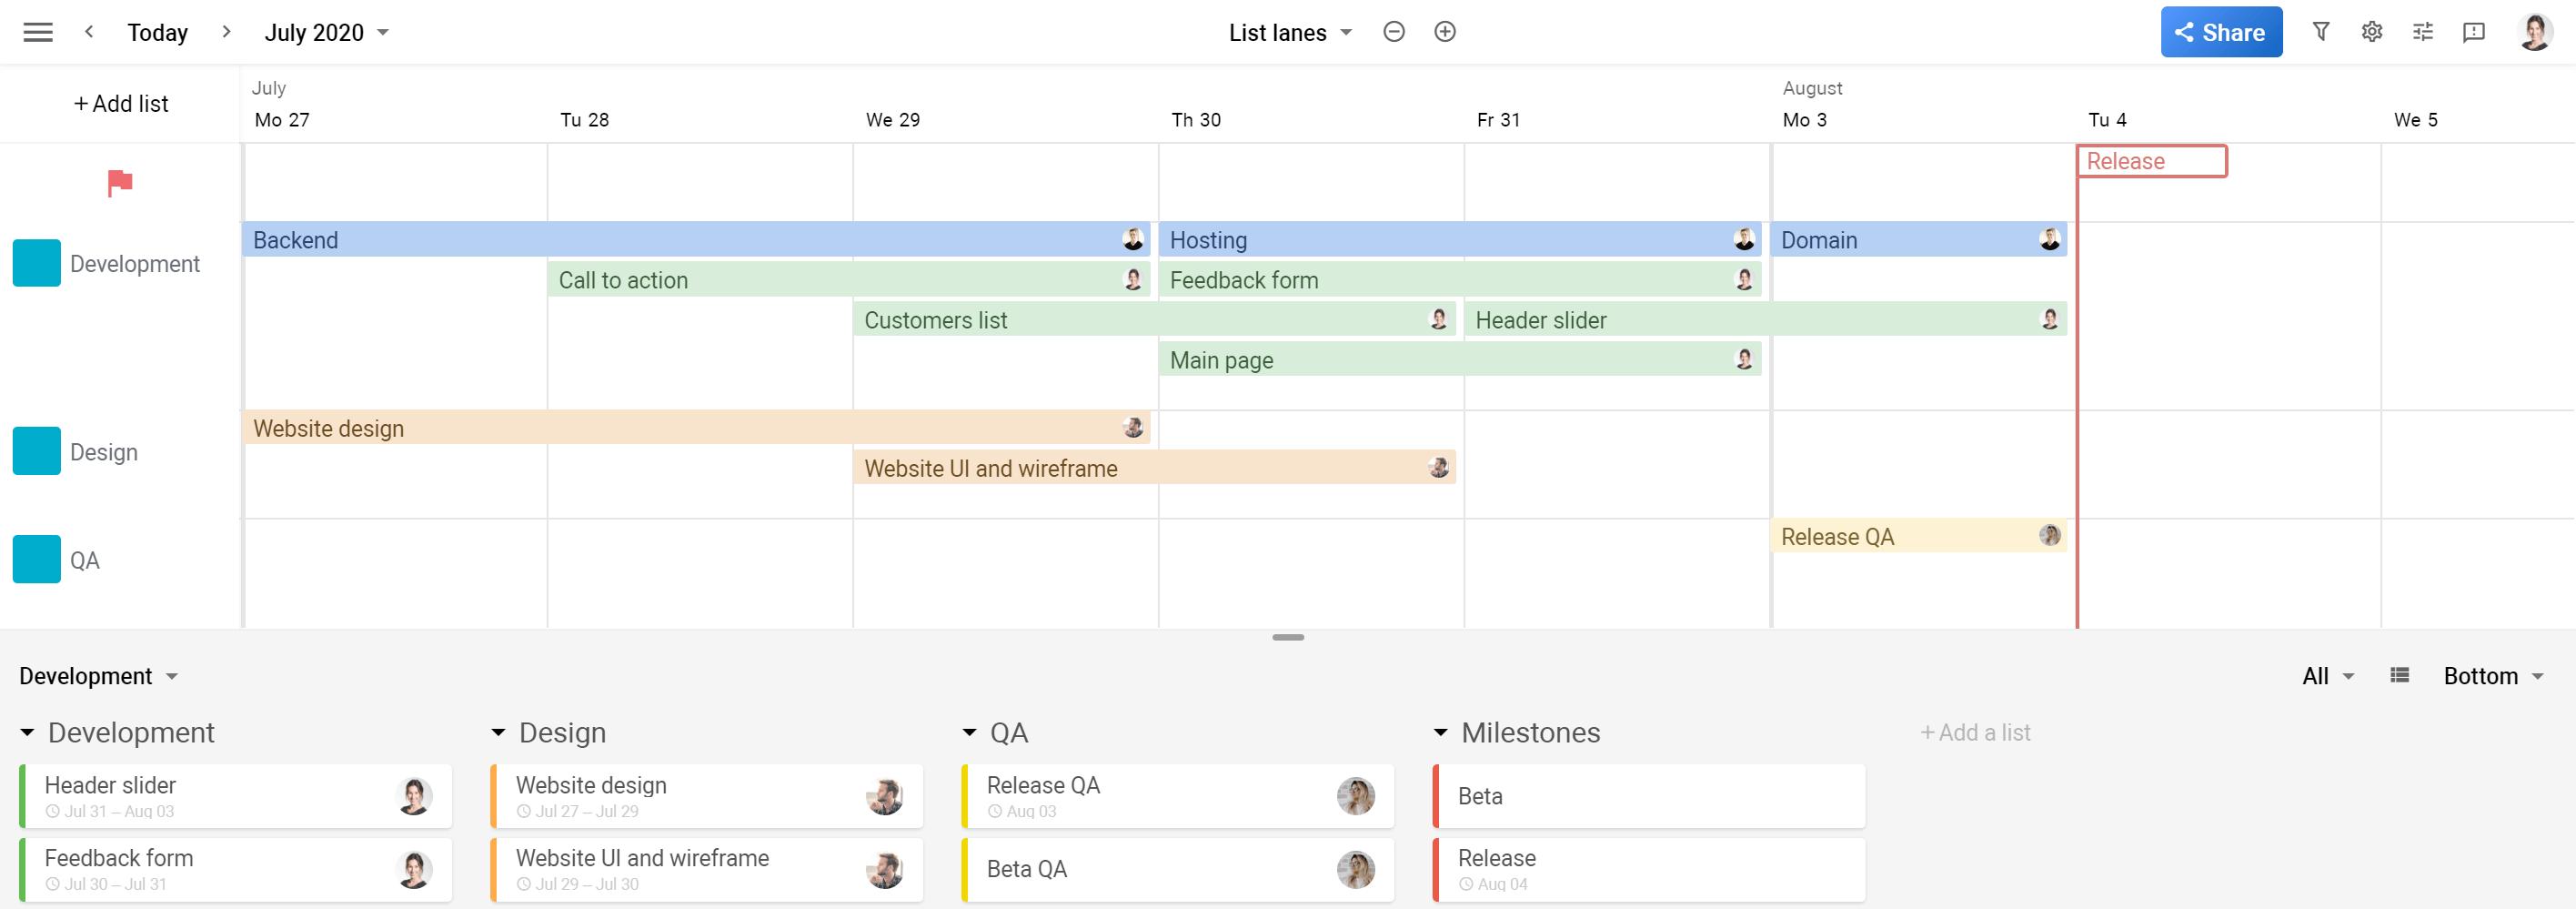 Planyway Team timeline list lanes